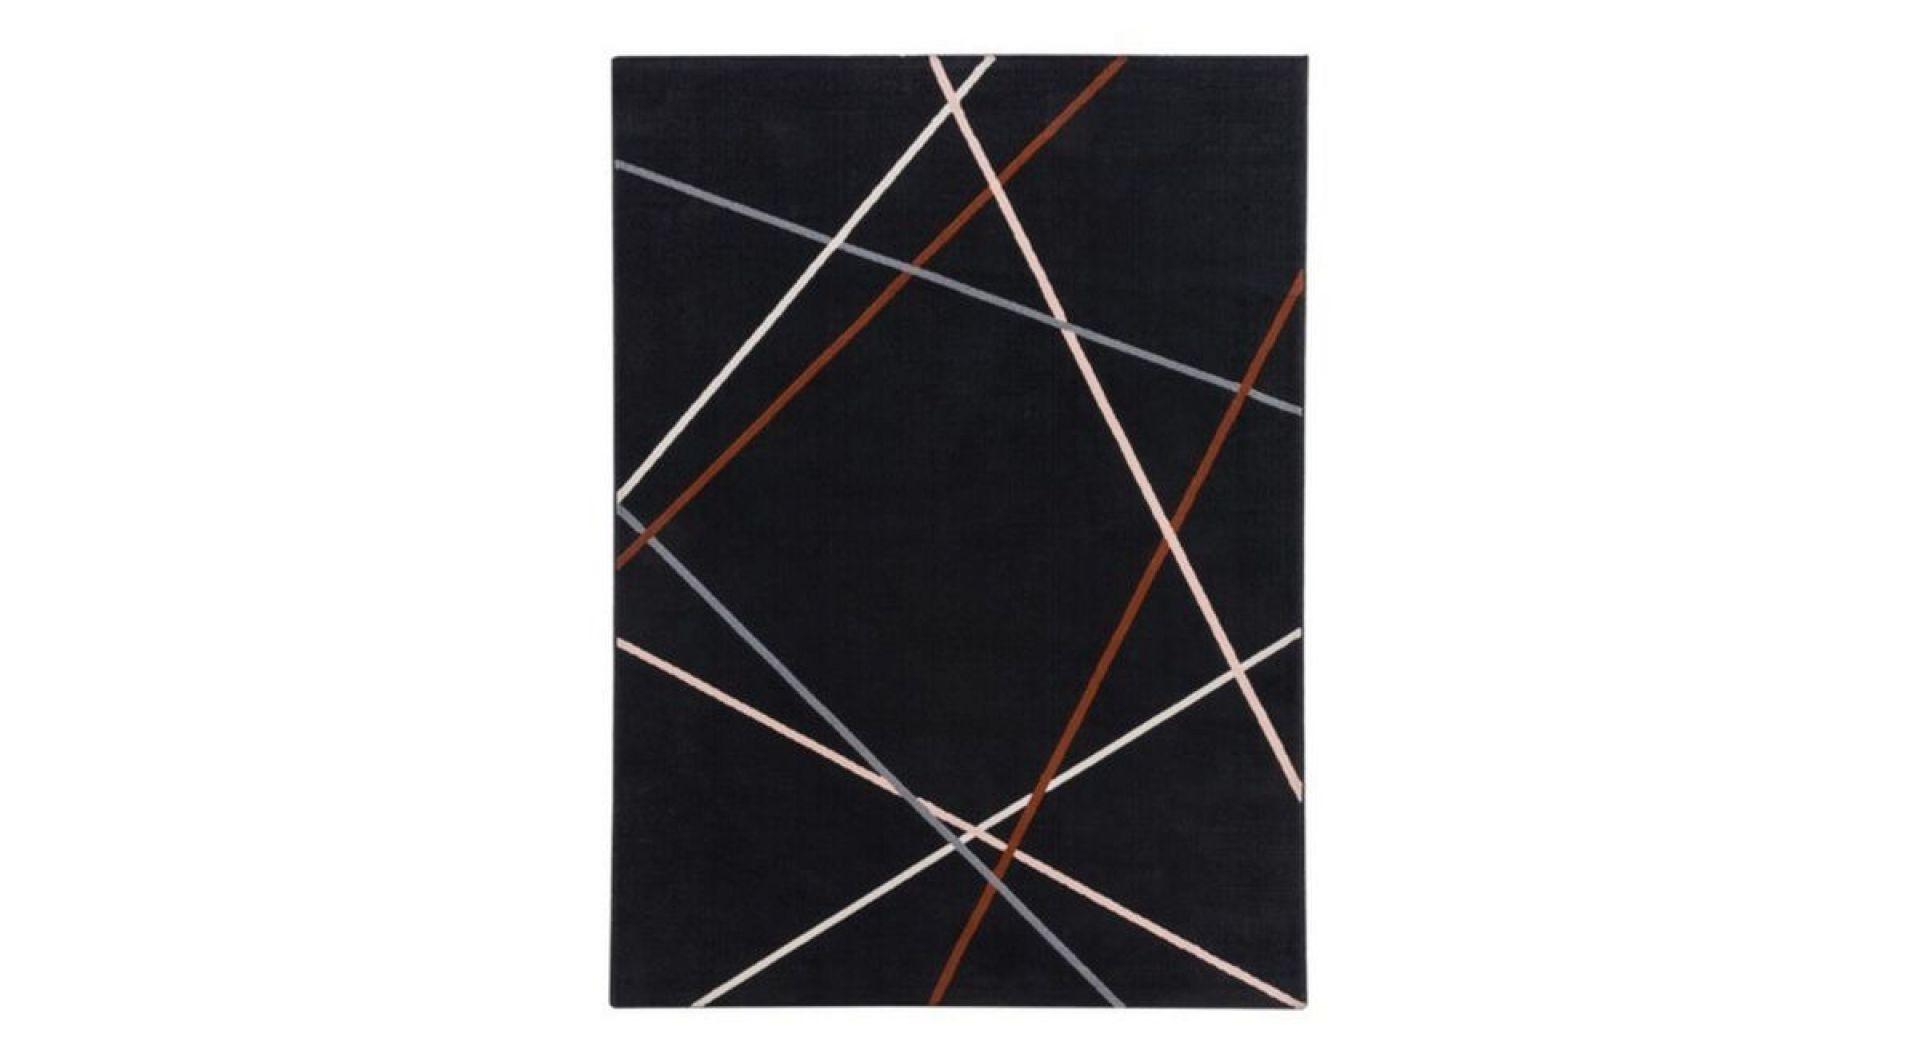 Dywan Tulla. Cena: 152,10 zł (120x170 cm). Fot. Salony Agata